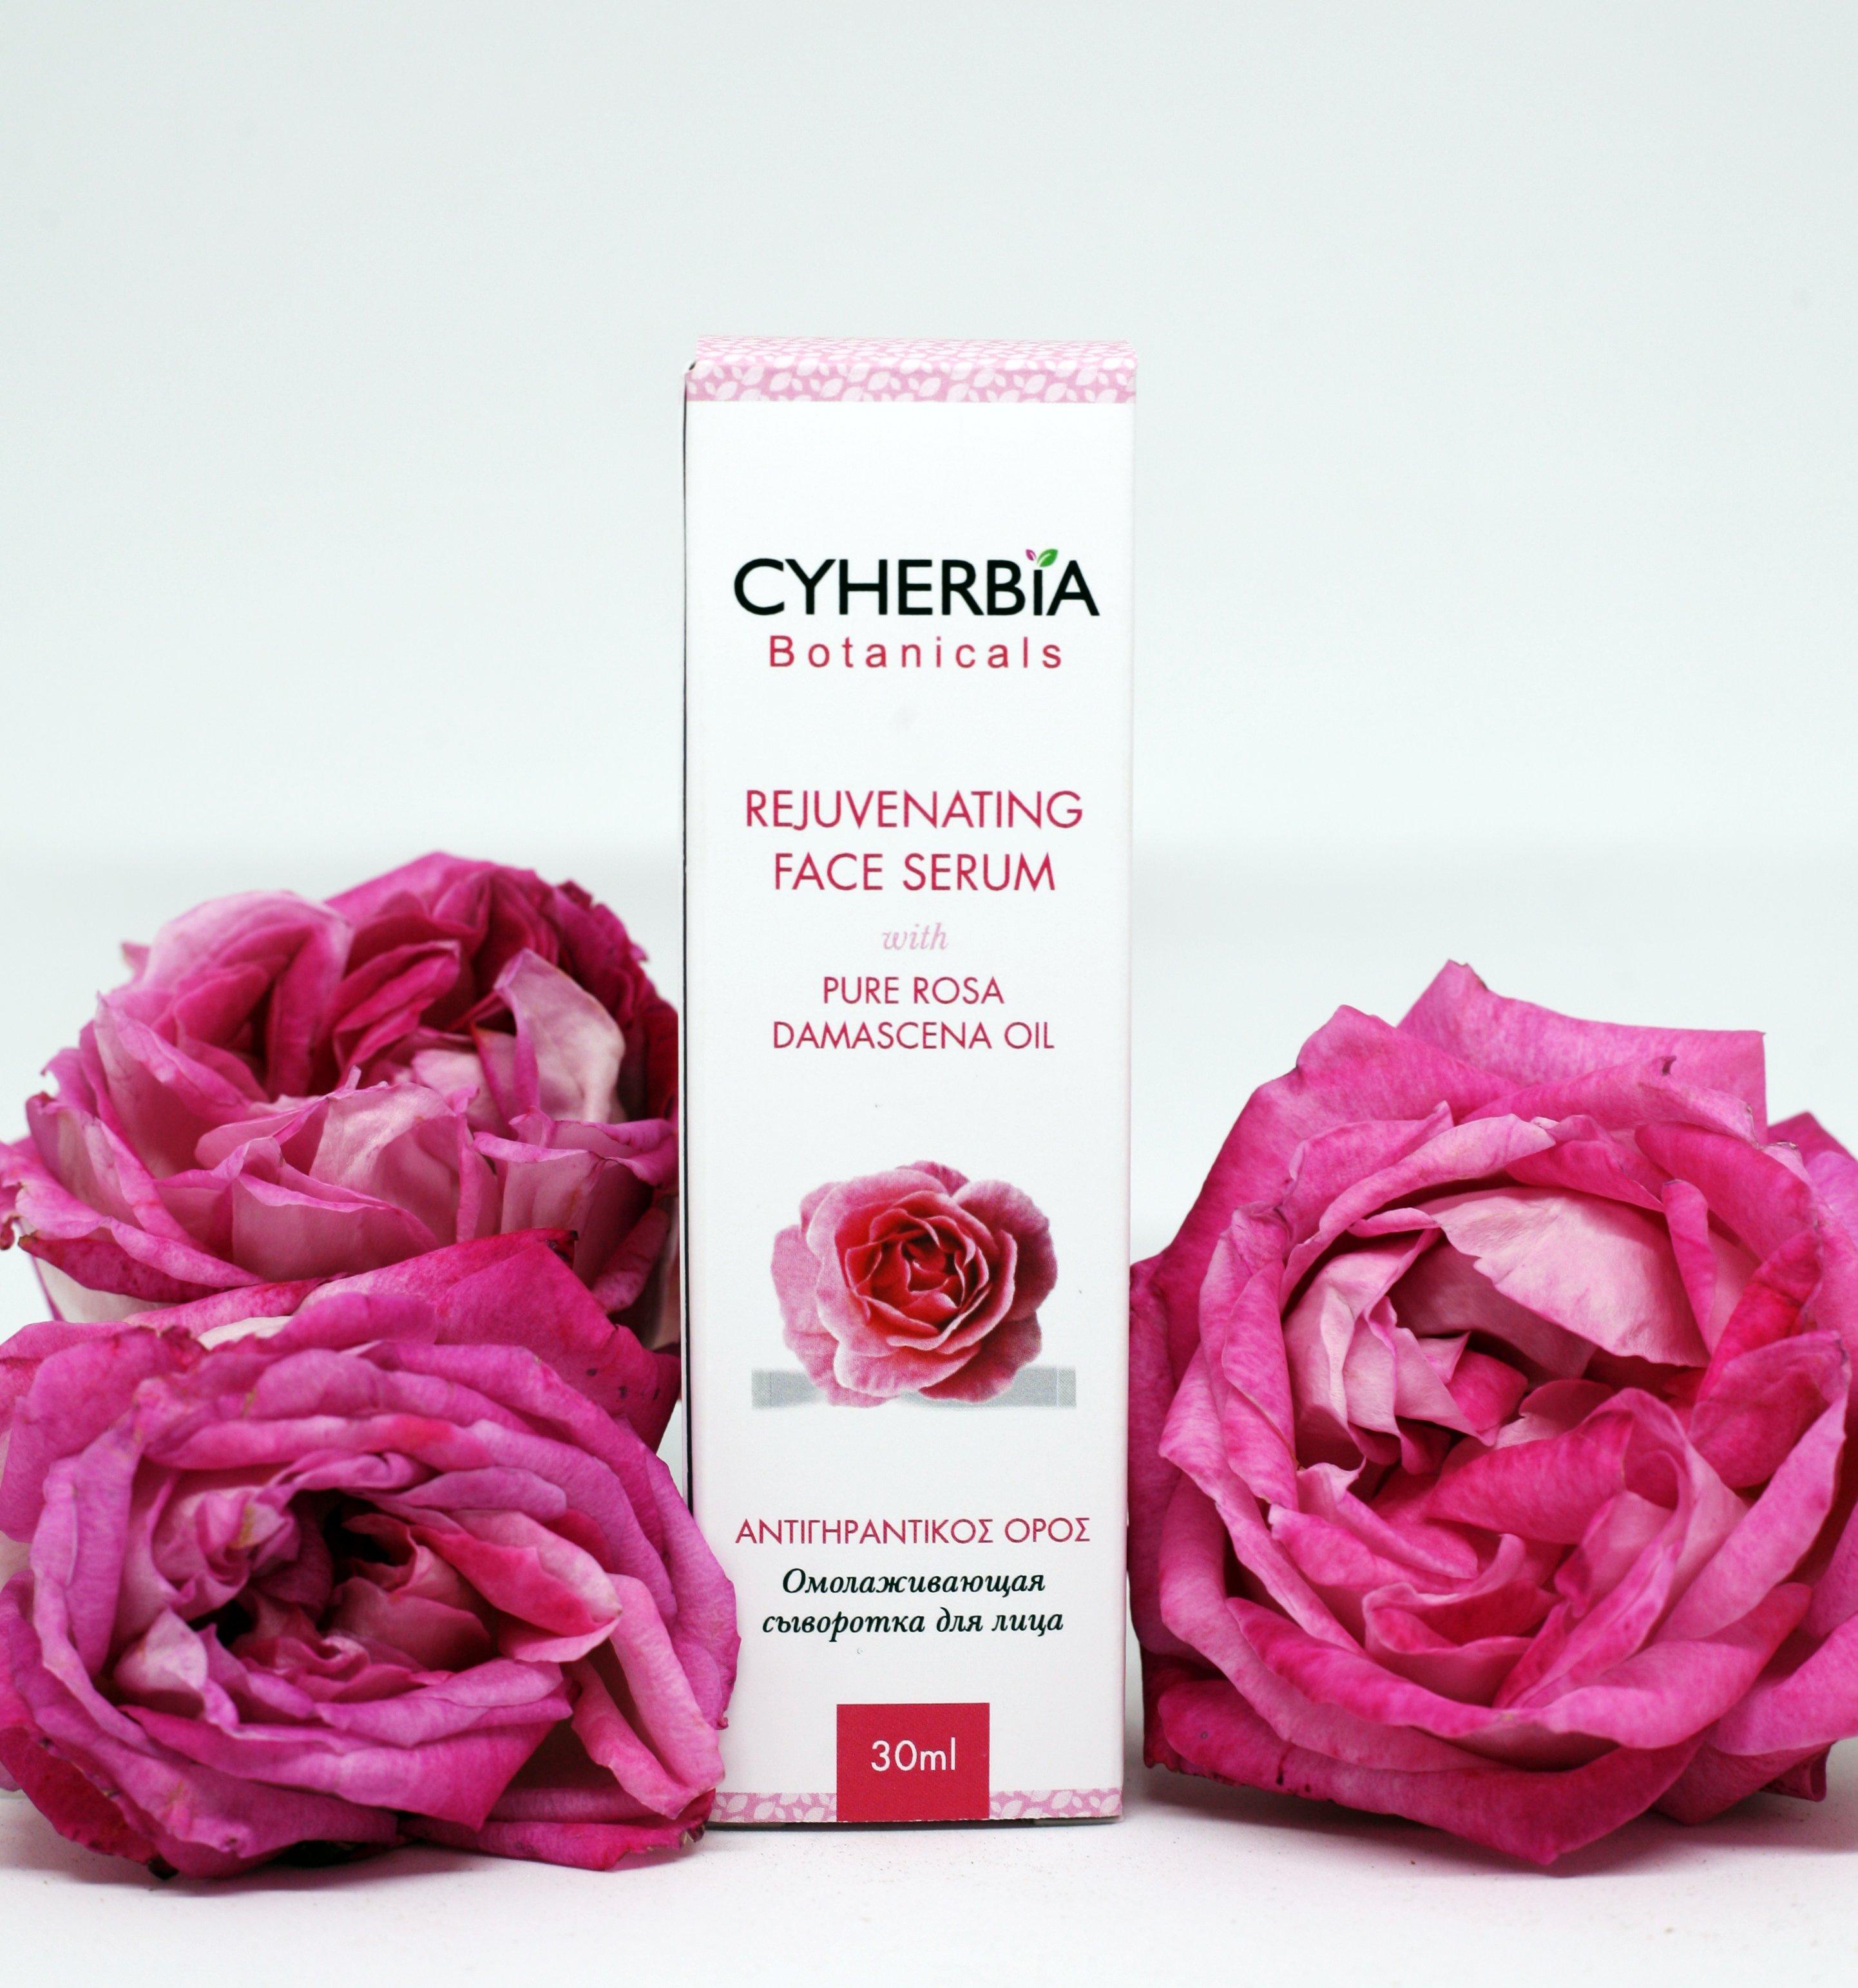 Rejuvenating Face Serum with Pure Rosa Damascena Oil, 30ml